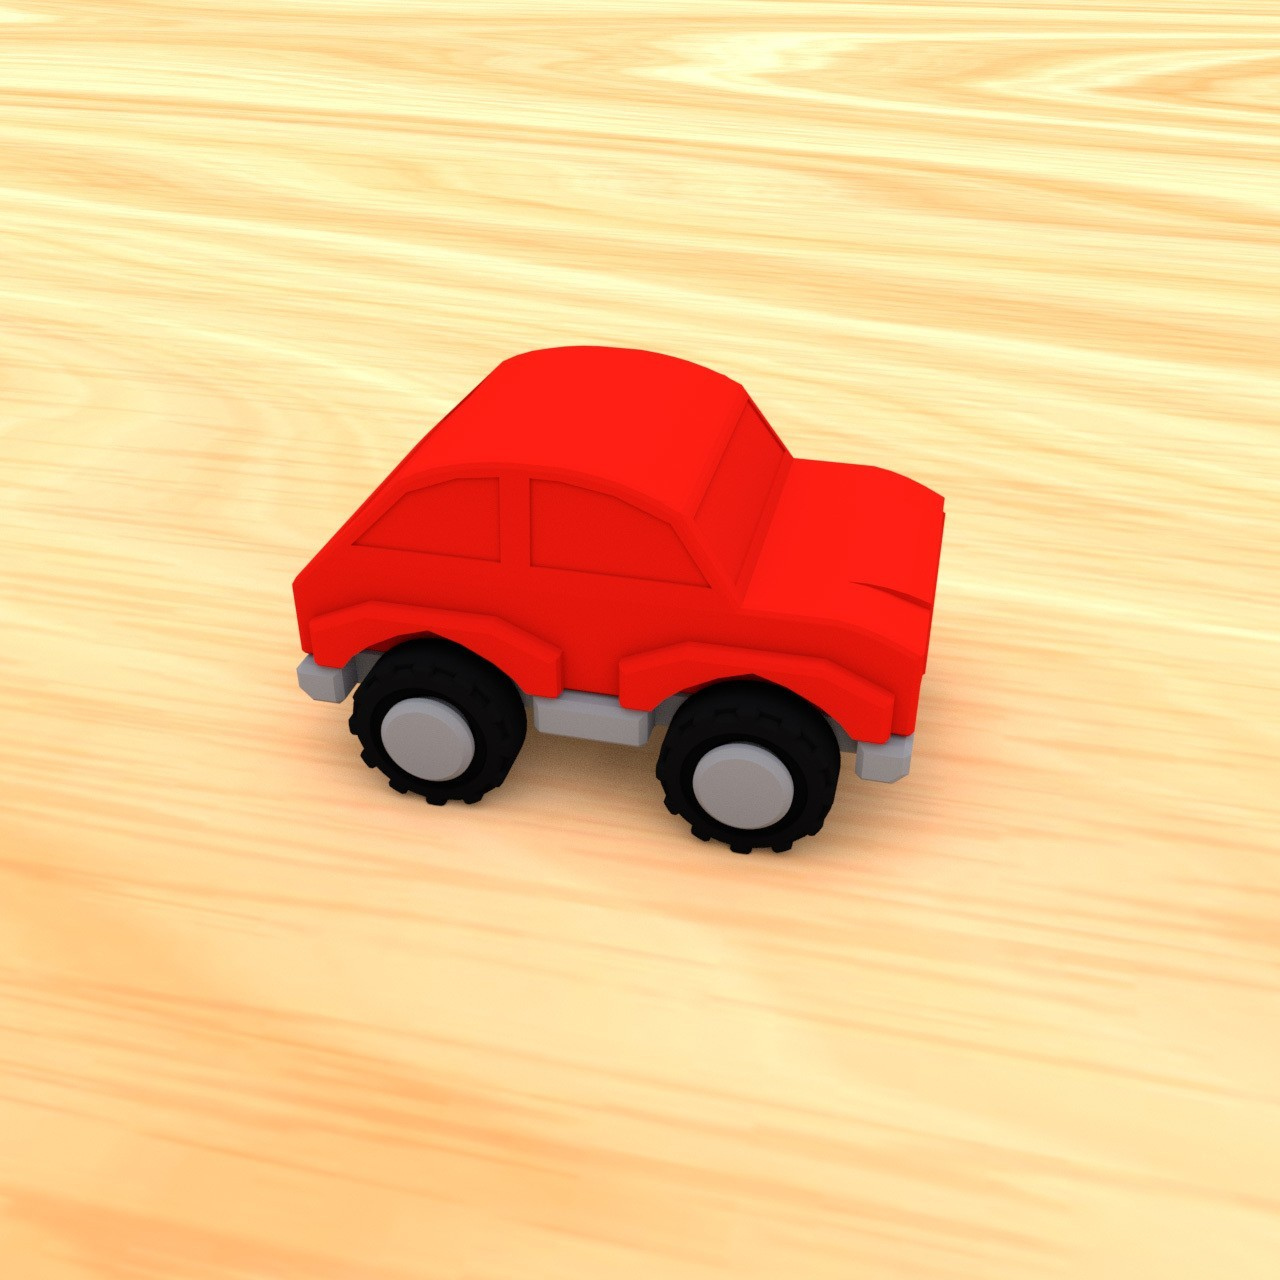 smalltoys-carspack07.jpg Download STL file SmallToys - Cars pack • 3D print design, Wabby